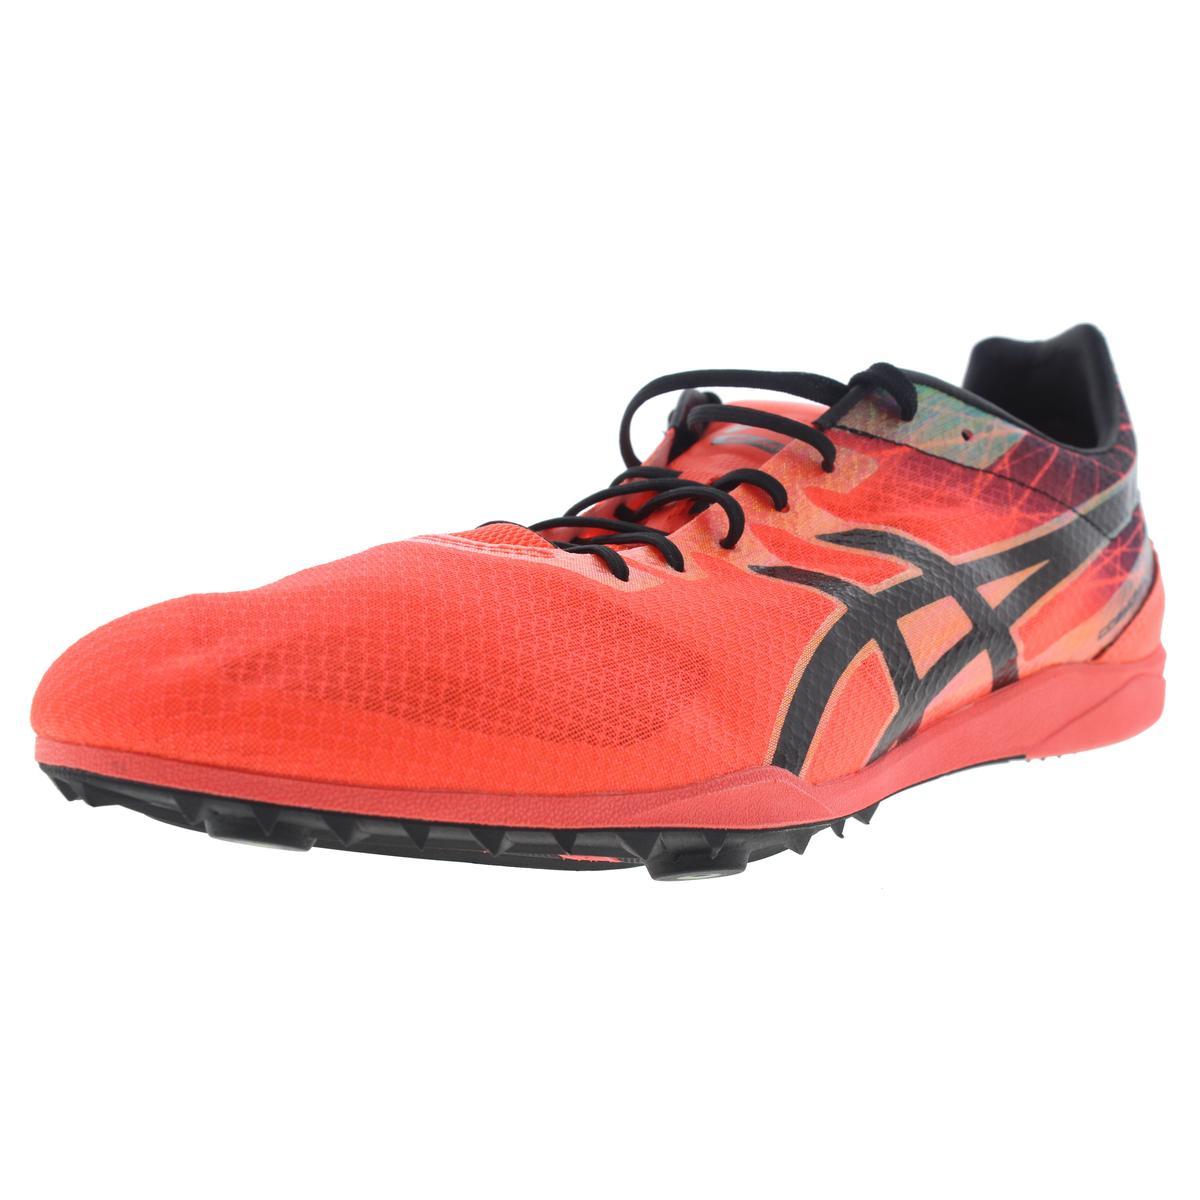 Asics Mens Cosmoracer LD Track Spikes Running Shoes